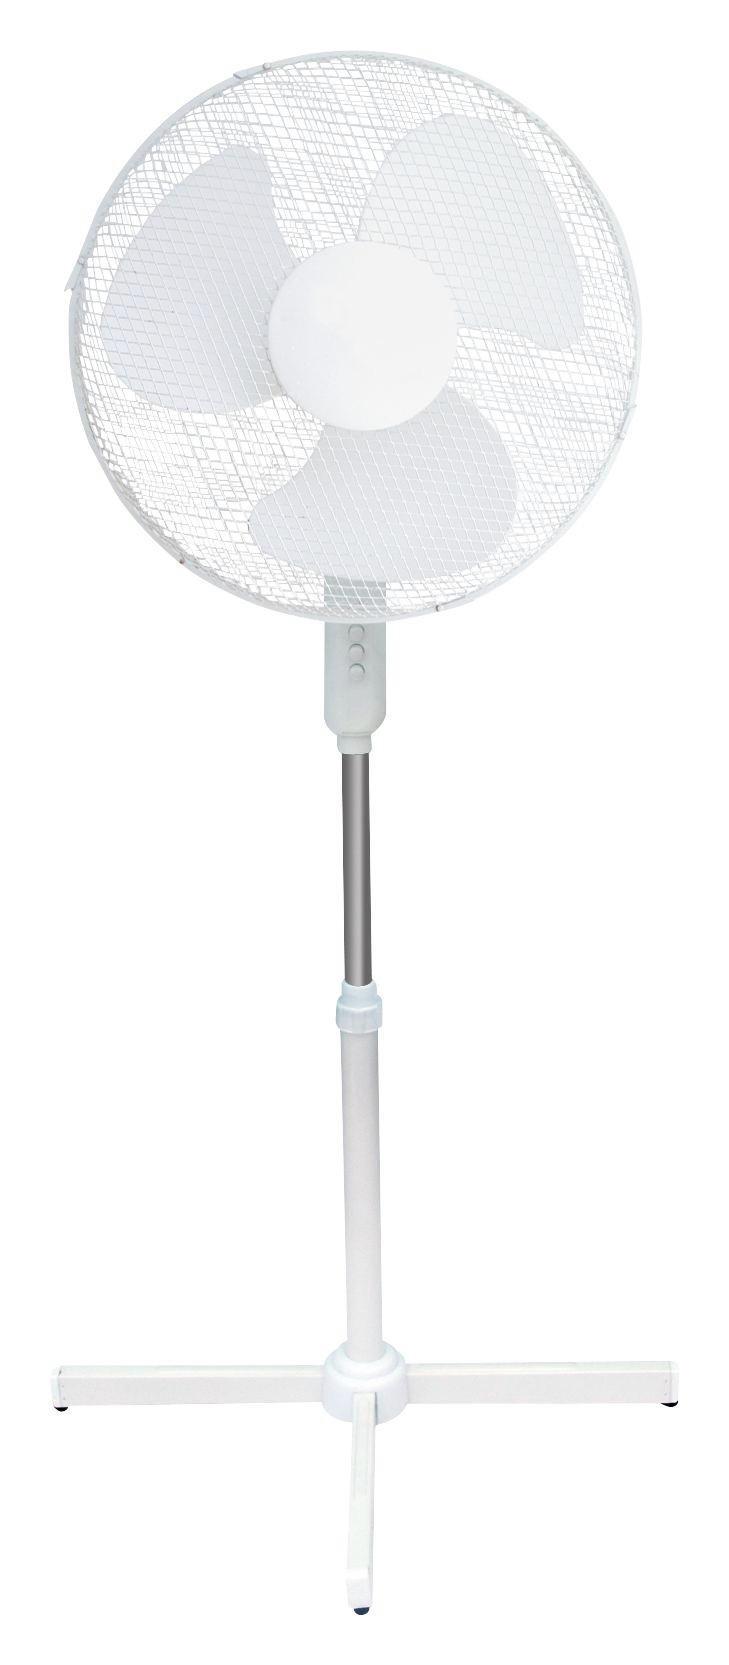 STANDVENTILATOR - Weiß, Basics, Kunststoff/Metall (60/60/120cm) - HOMEWARE